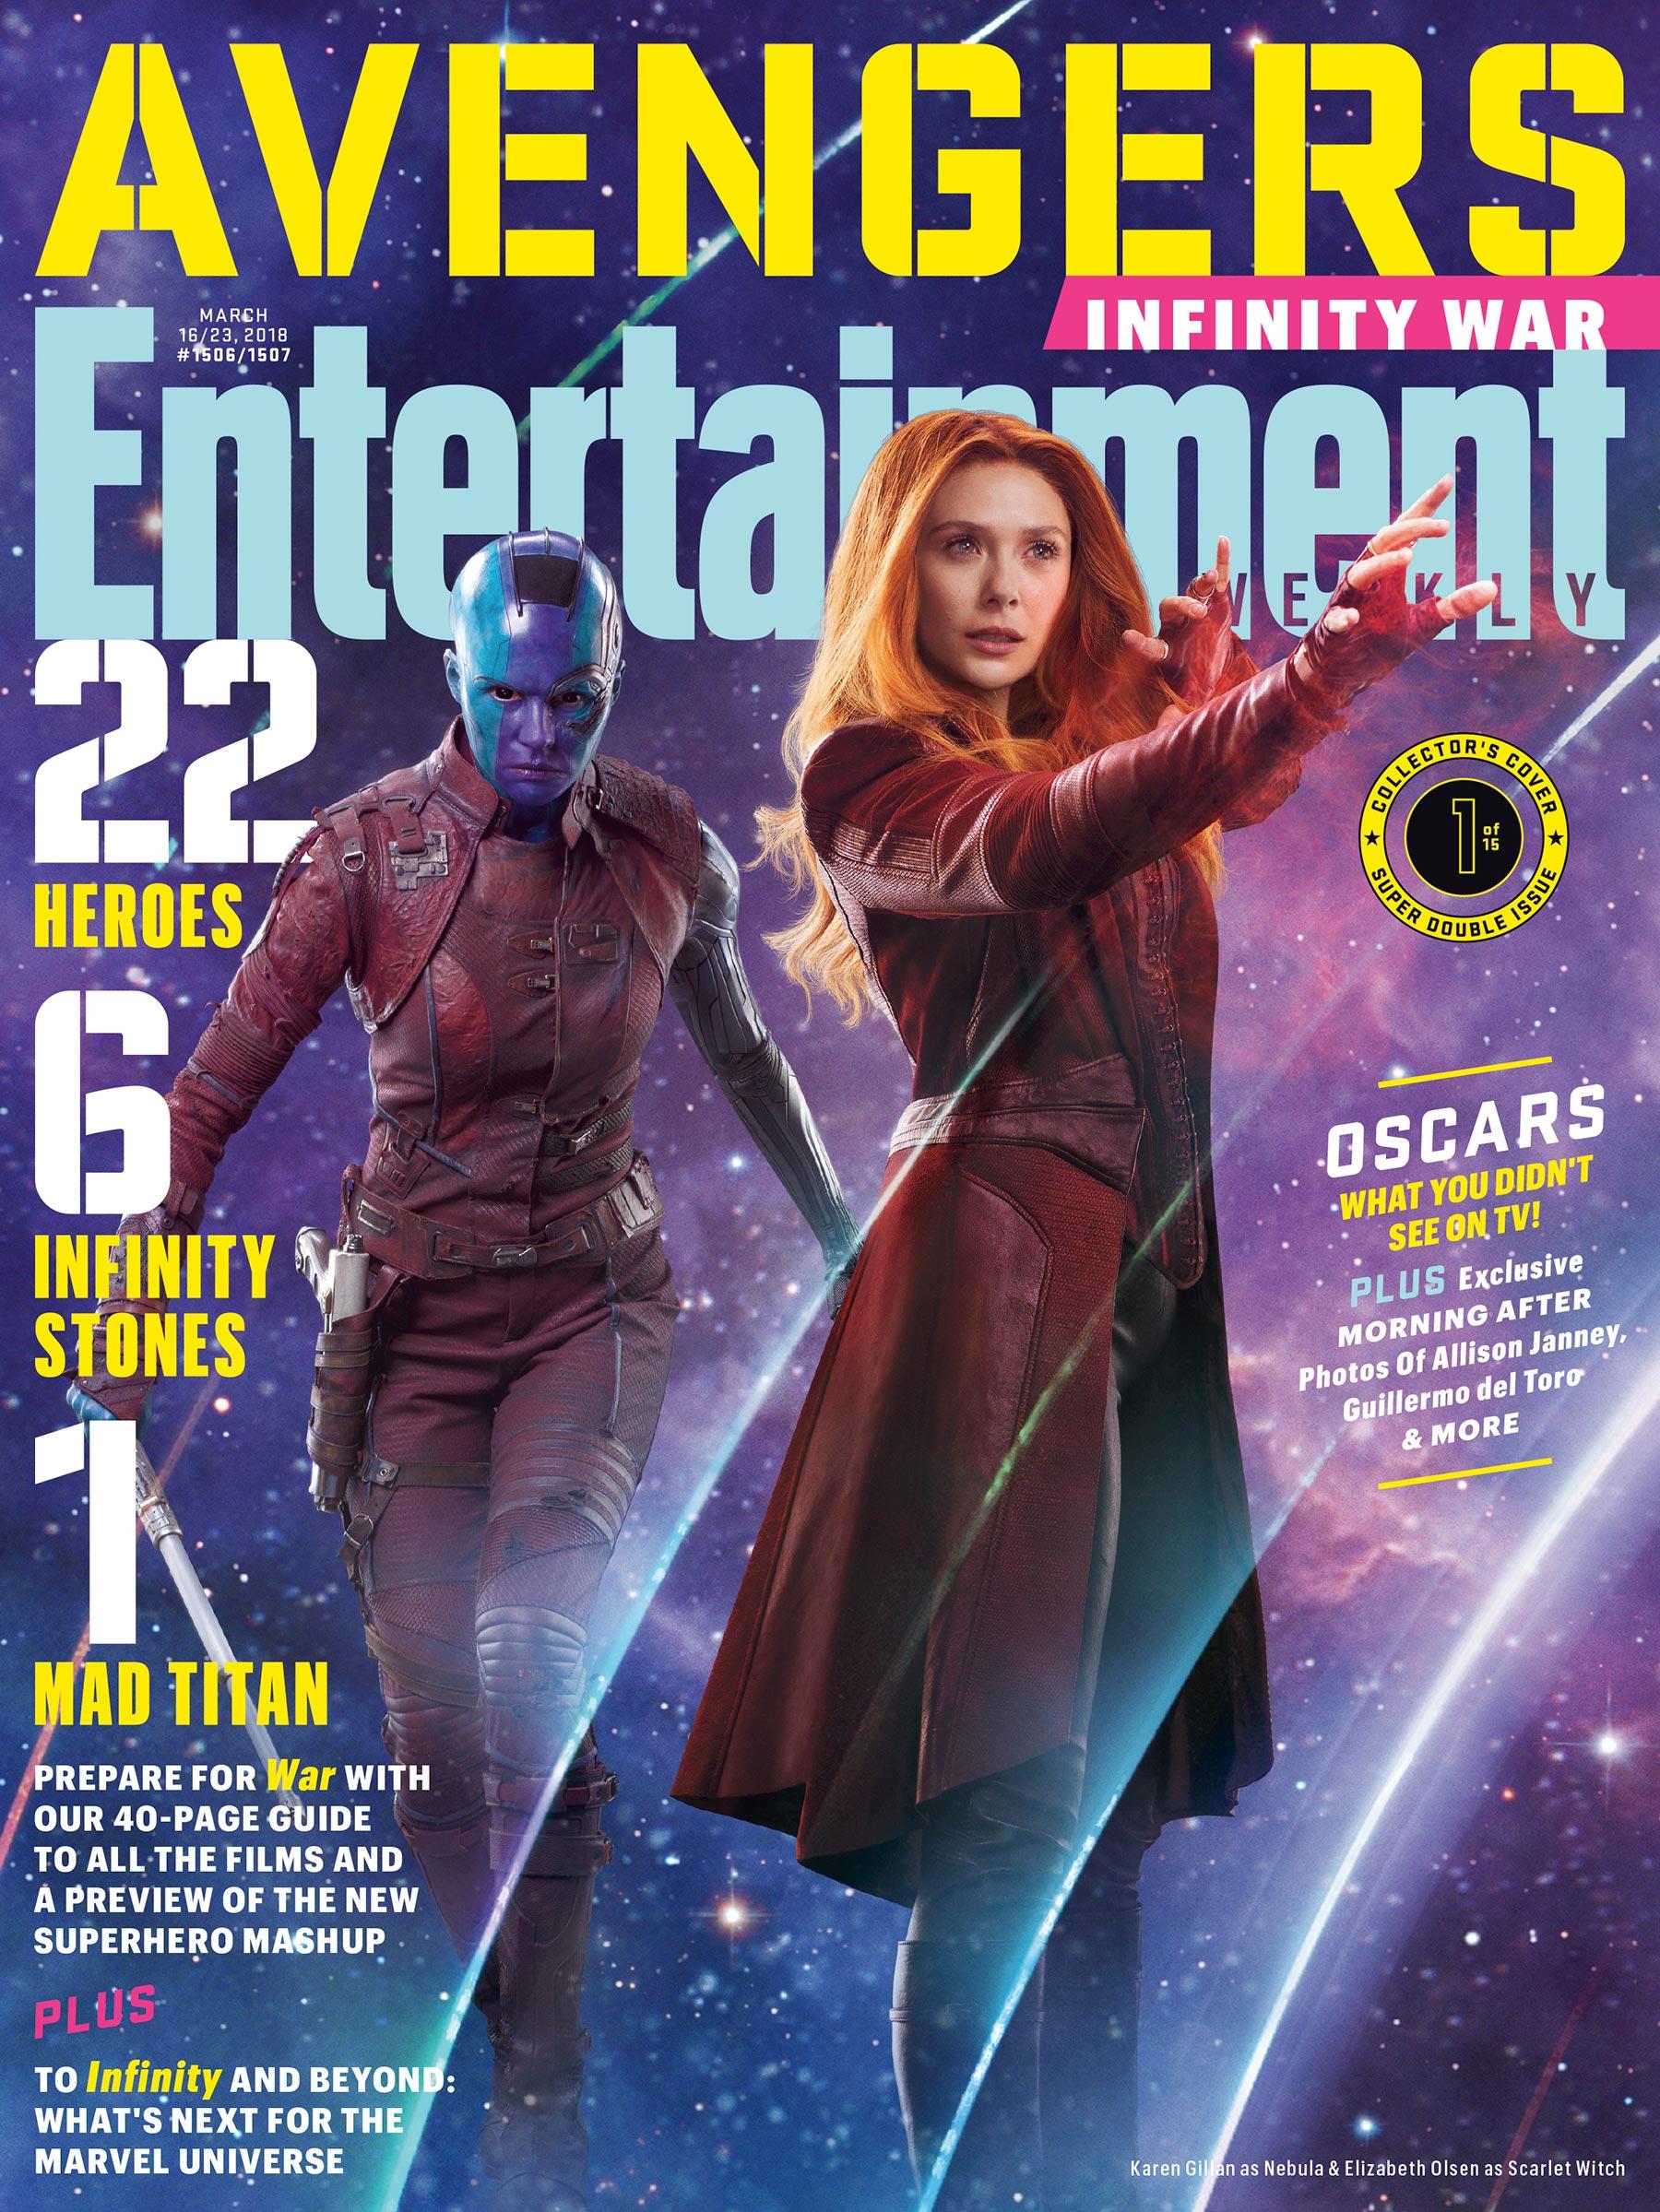 01-ewcover-avengers-scarlet-witch-nebula